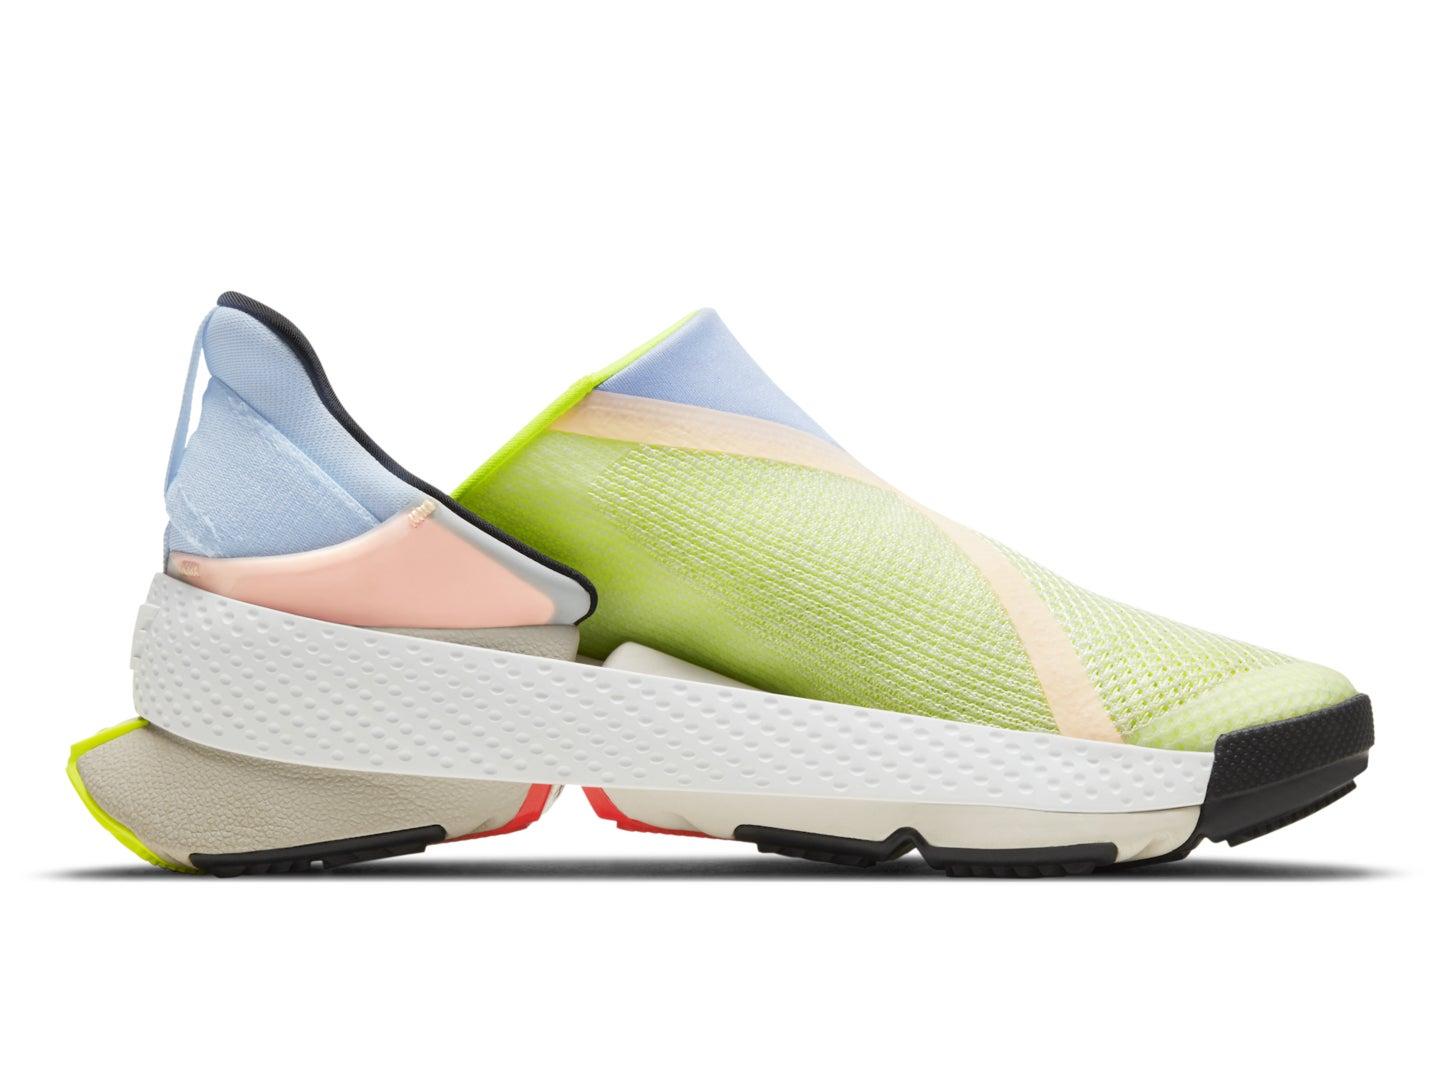 Nike's Go FlyEase sneaker on white.